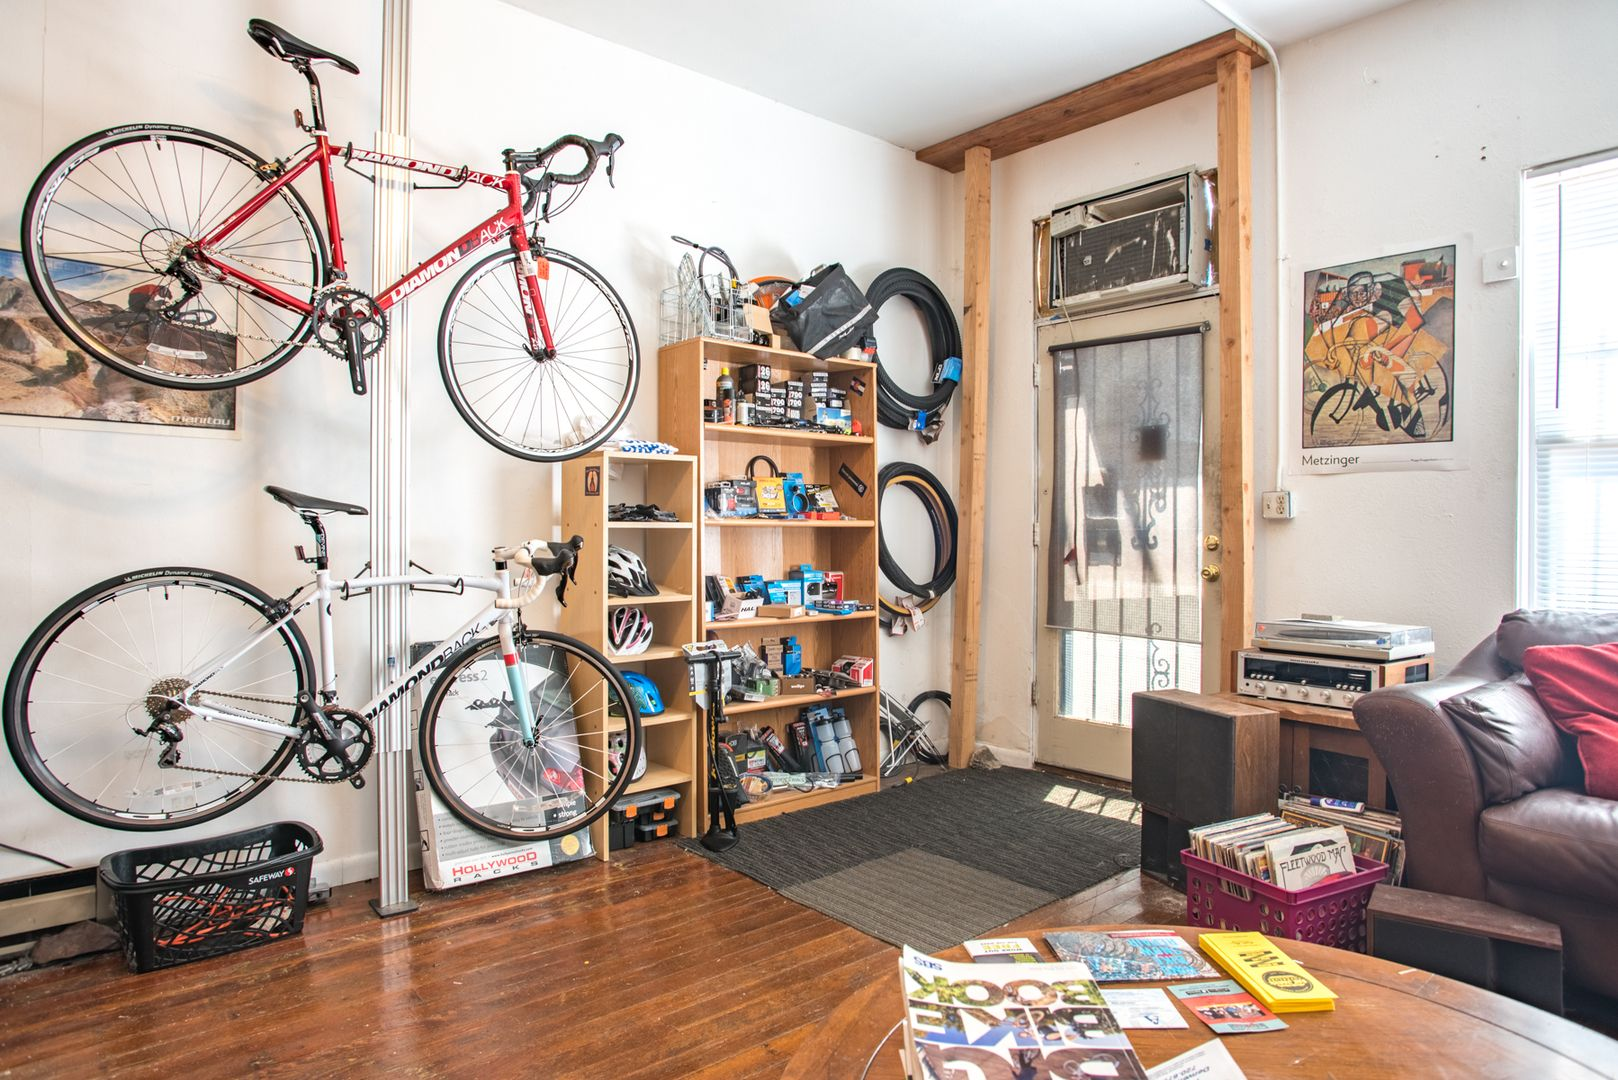 Rino Bike Snow Repair Is Denver S Best Bike Ski And Snowboard